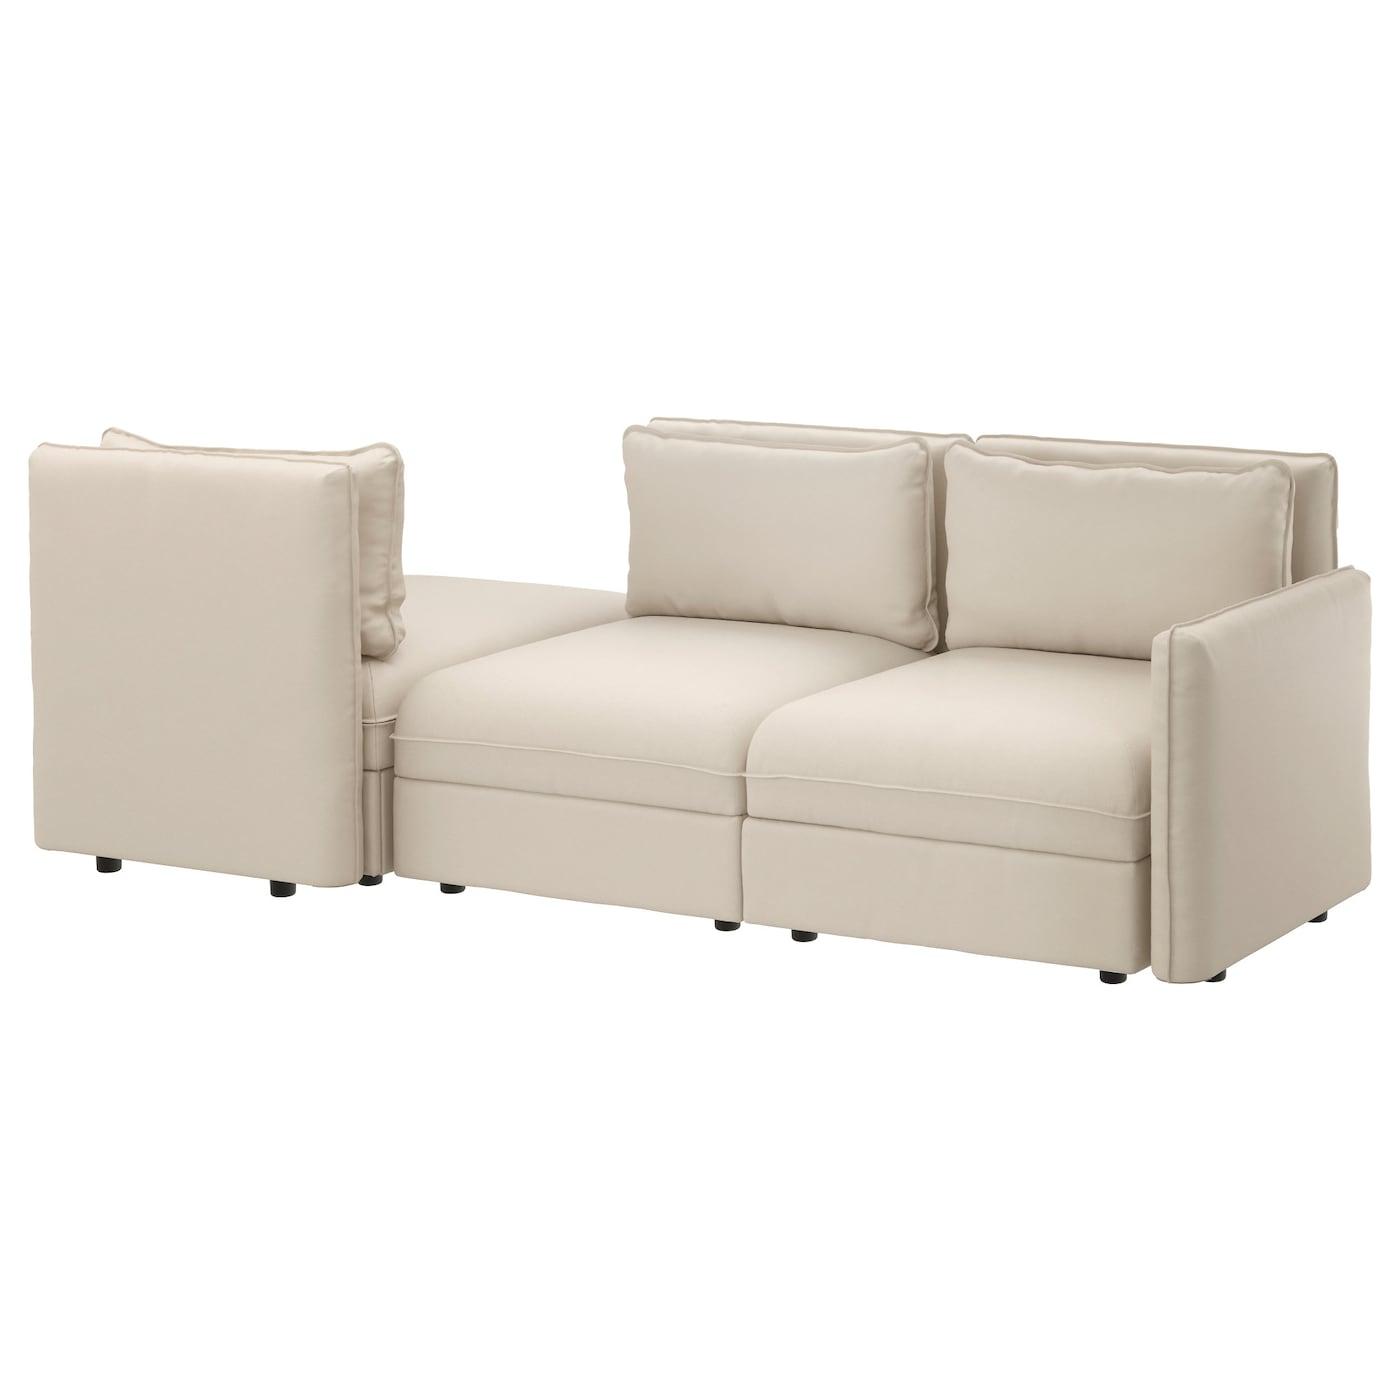 vallentuna 3 seat sofa with bed ramna dark beige ikea. Black Bedroom Furniture Sets. Home Design Ideas